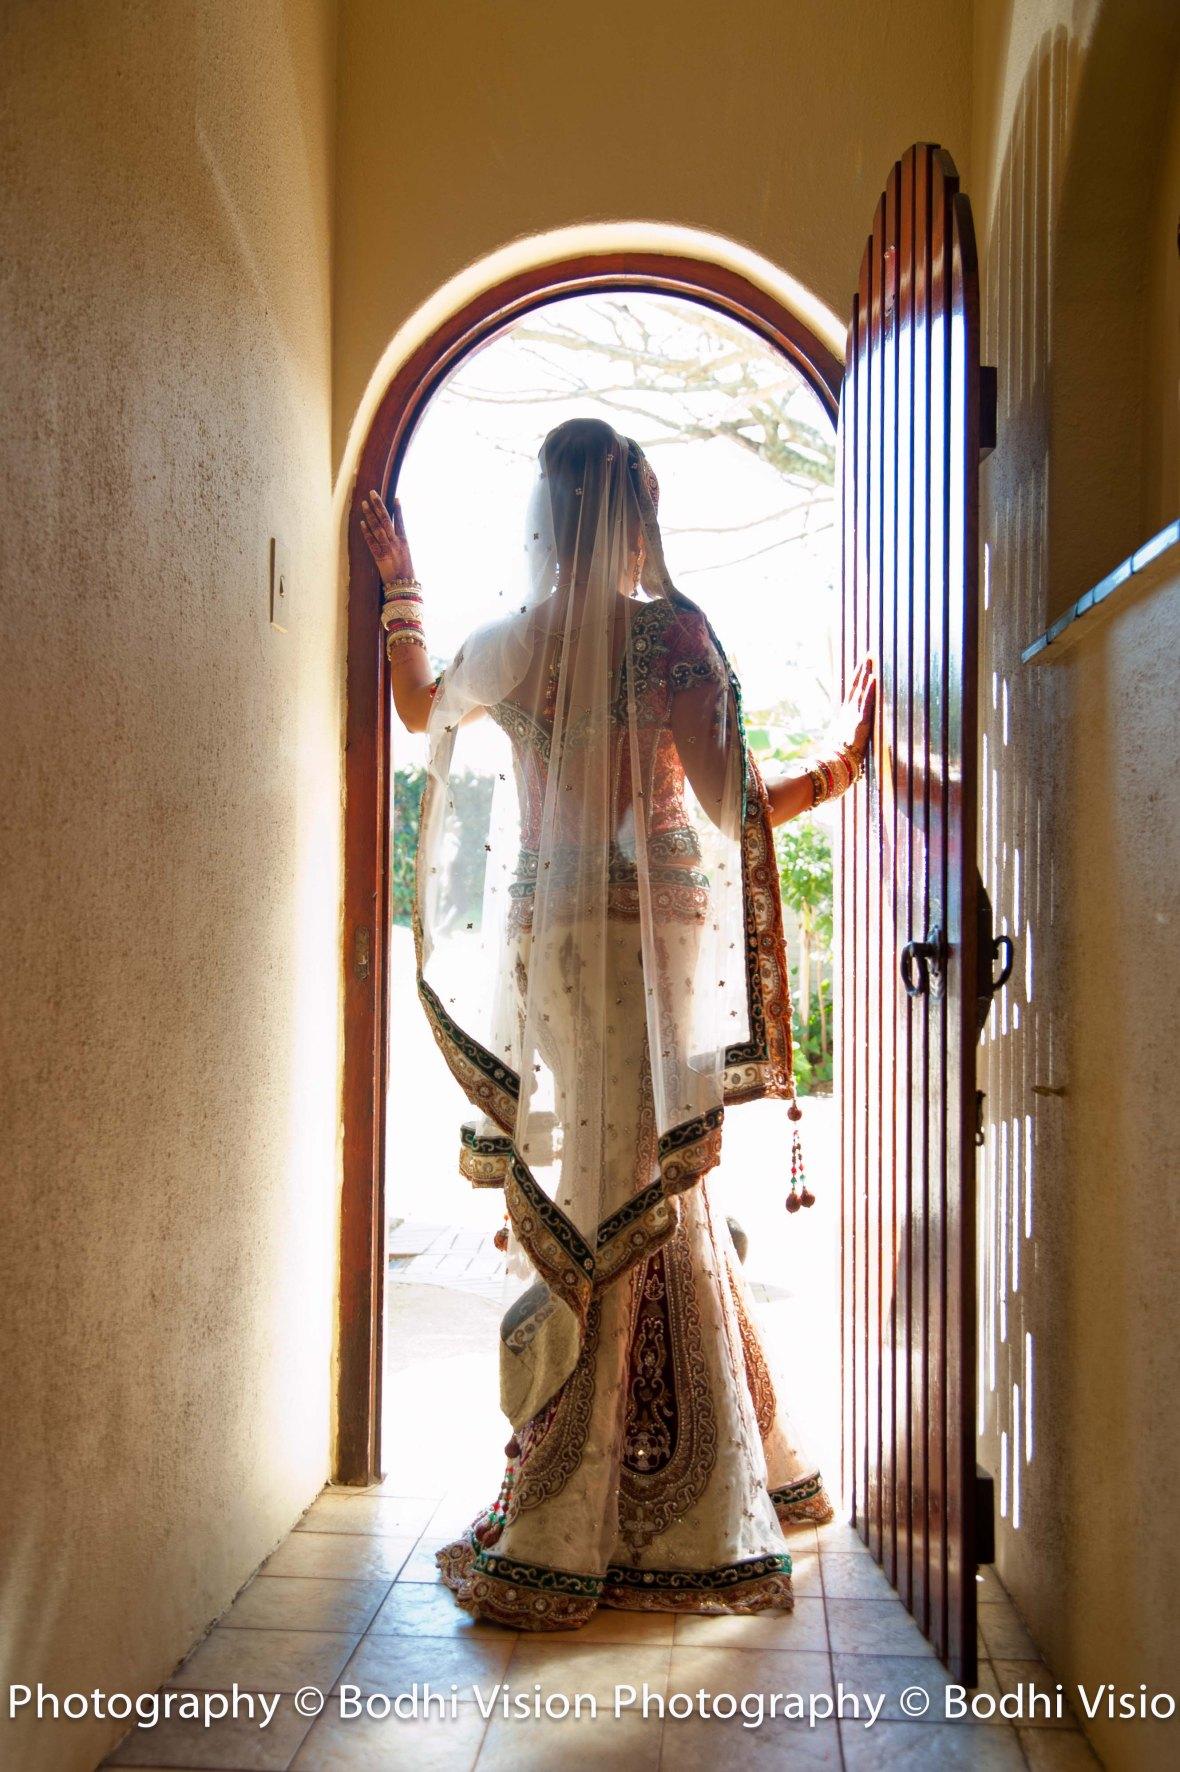 Bodhi Vision Photography, Vashnie Singh, Indian Bride & Groom, Durban KZN Hindu Wedding, Best Wedding Photographer Durban